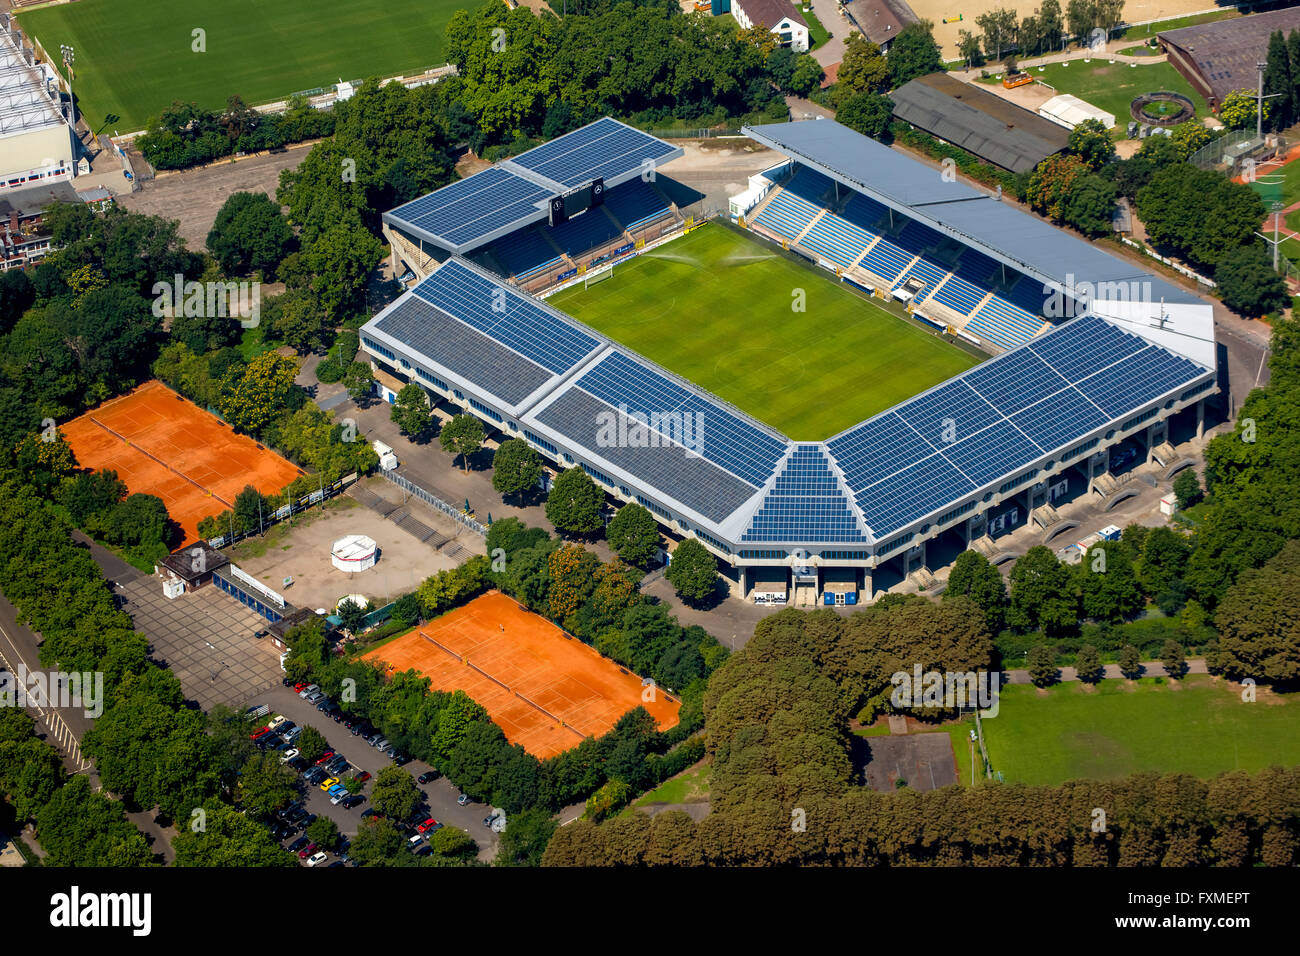 Aerial view, Carl-Benz-Stadion Mannheim, football stadium, Mannheim, Baden-Württemberg, Germany, Europe, Aerial - Stock Image